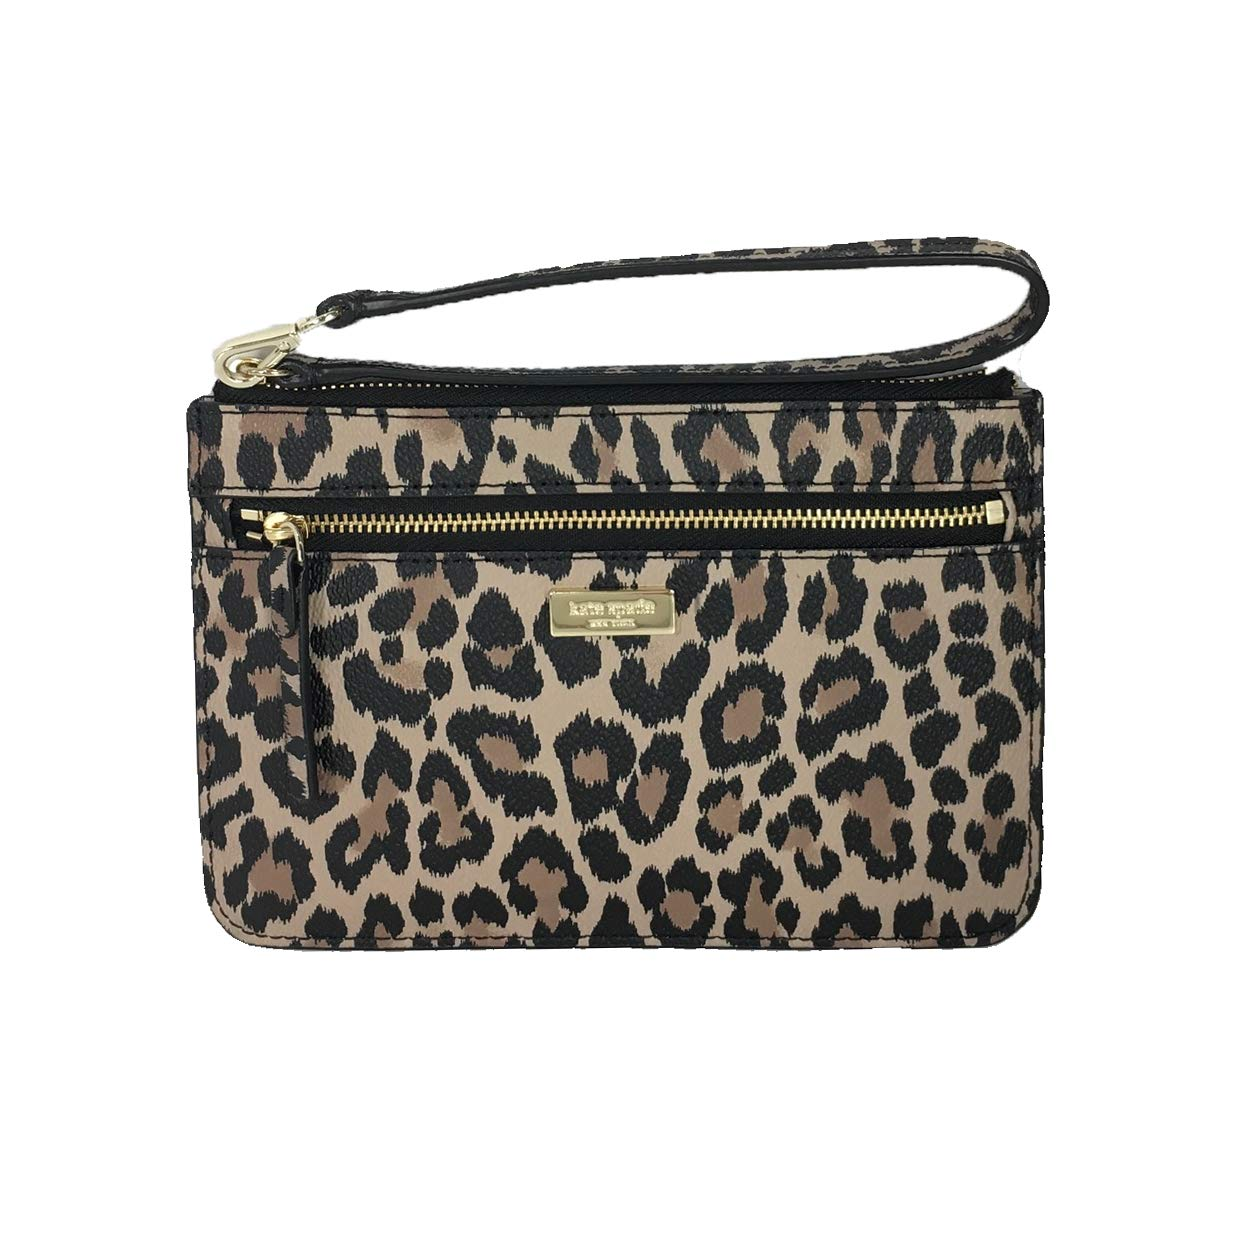 Kate Spade Shore Street Tinie Wristlet, Leopard WLRU4974